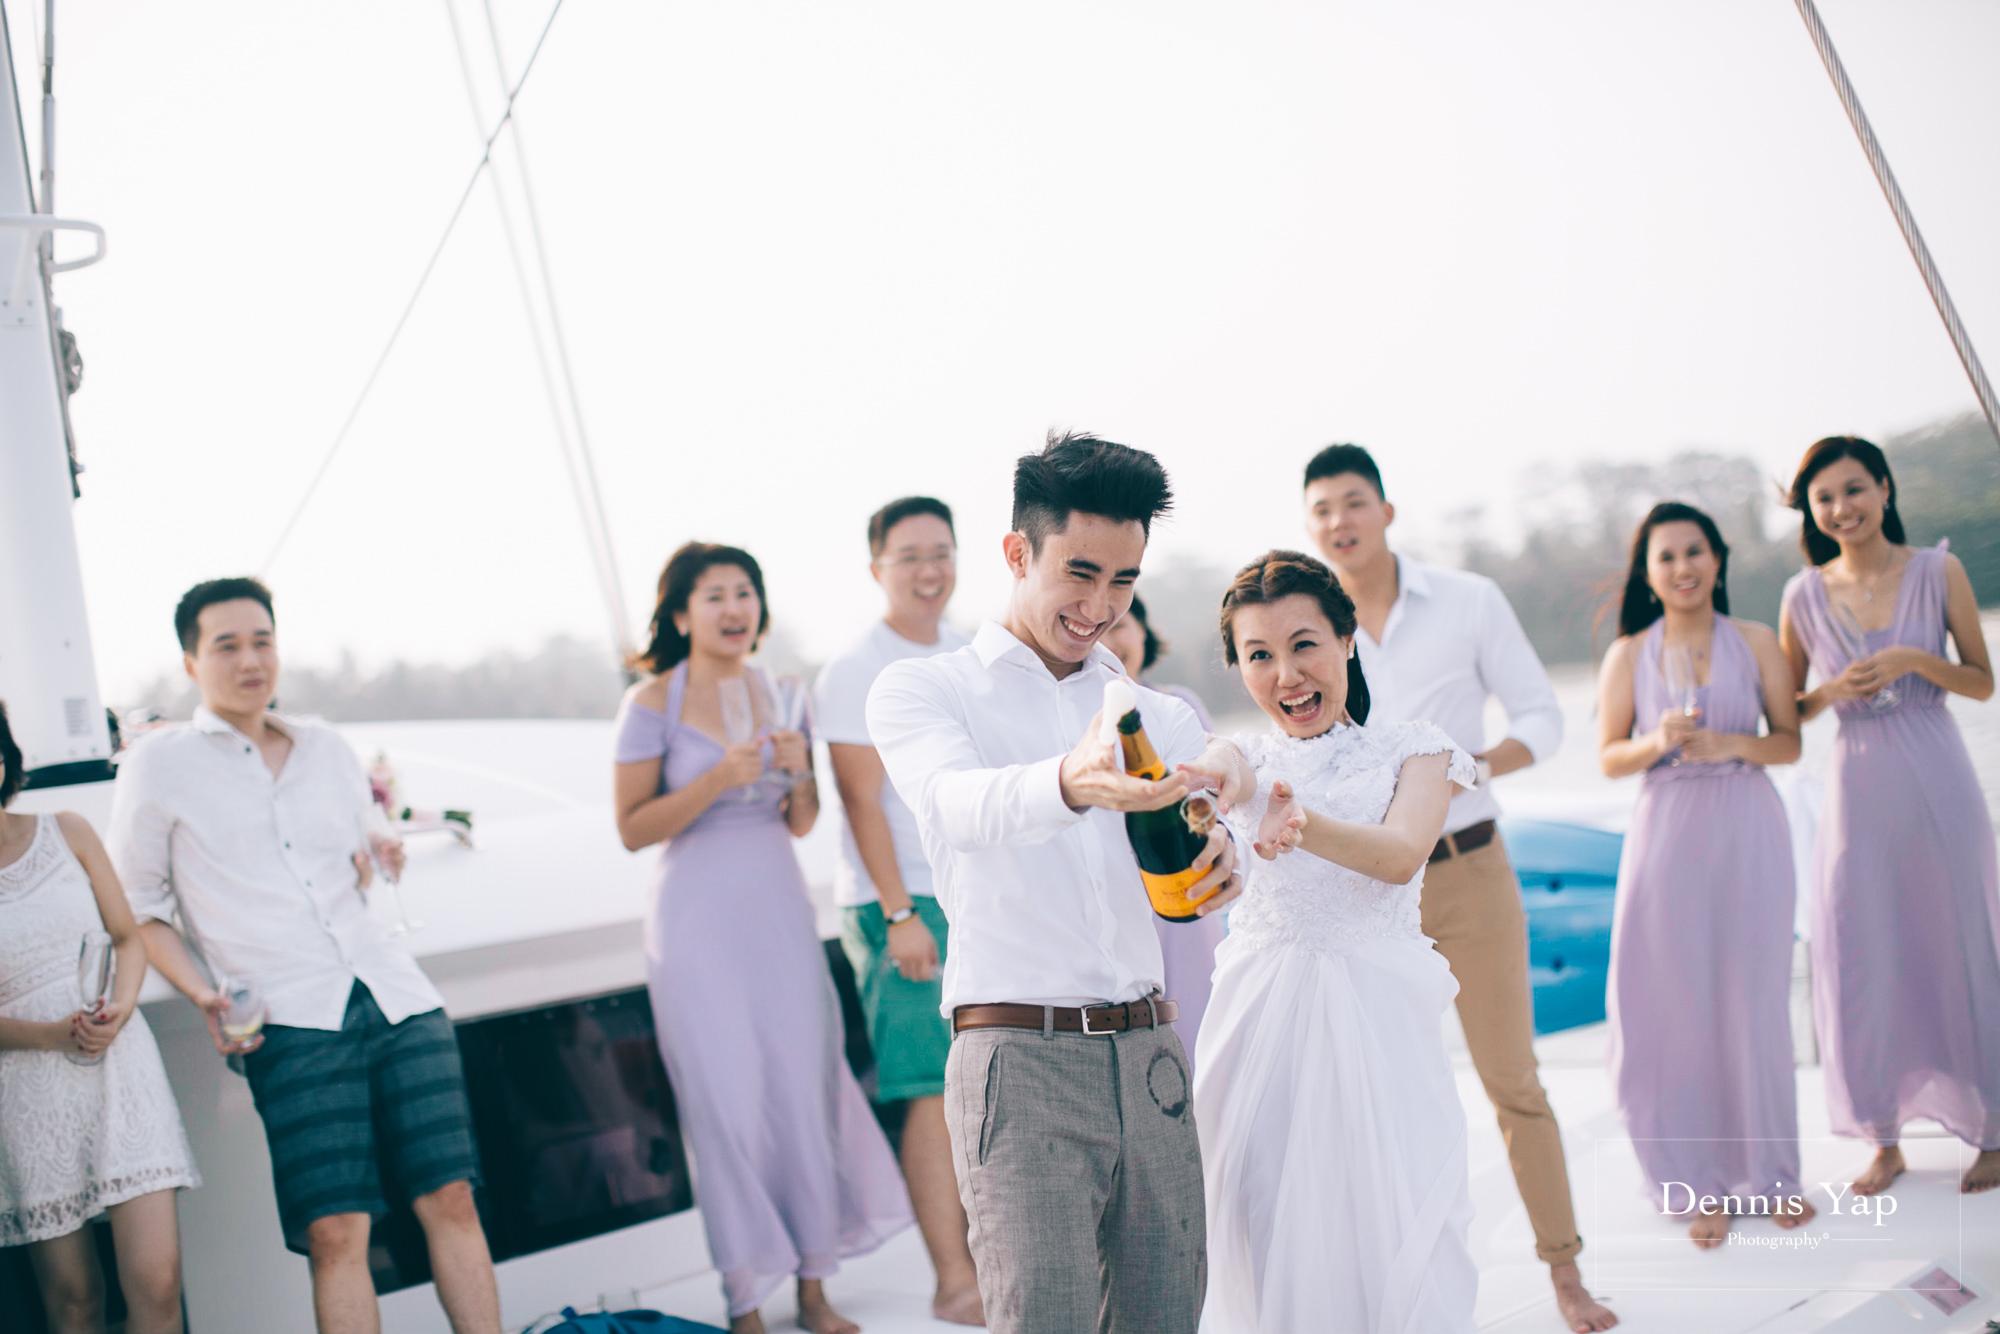 danny sherine wedding reception registration of marriage yacht fun beloved sea dennis yap photography malaysia top wedding photographer-31.jpg